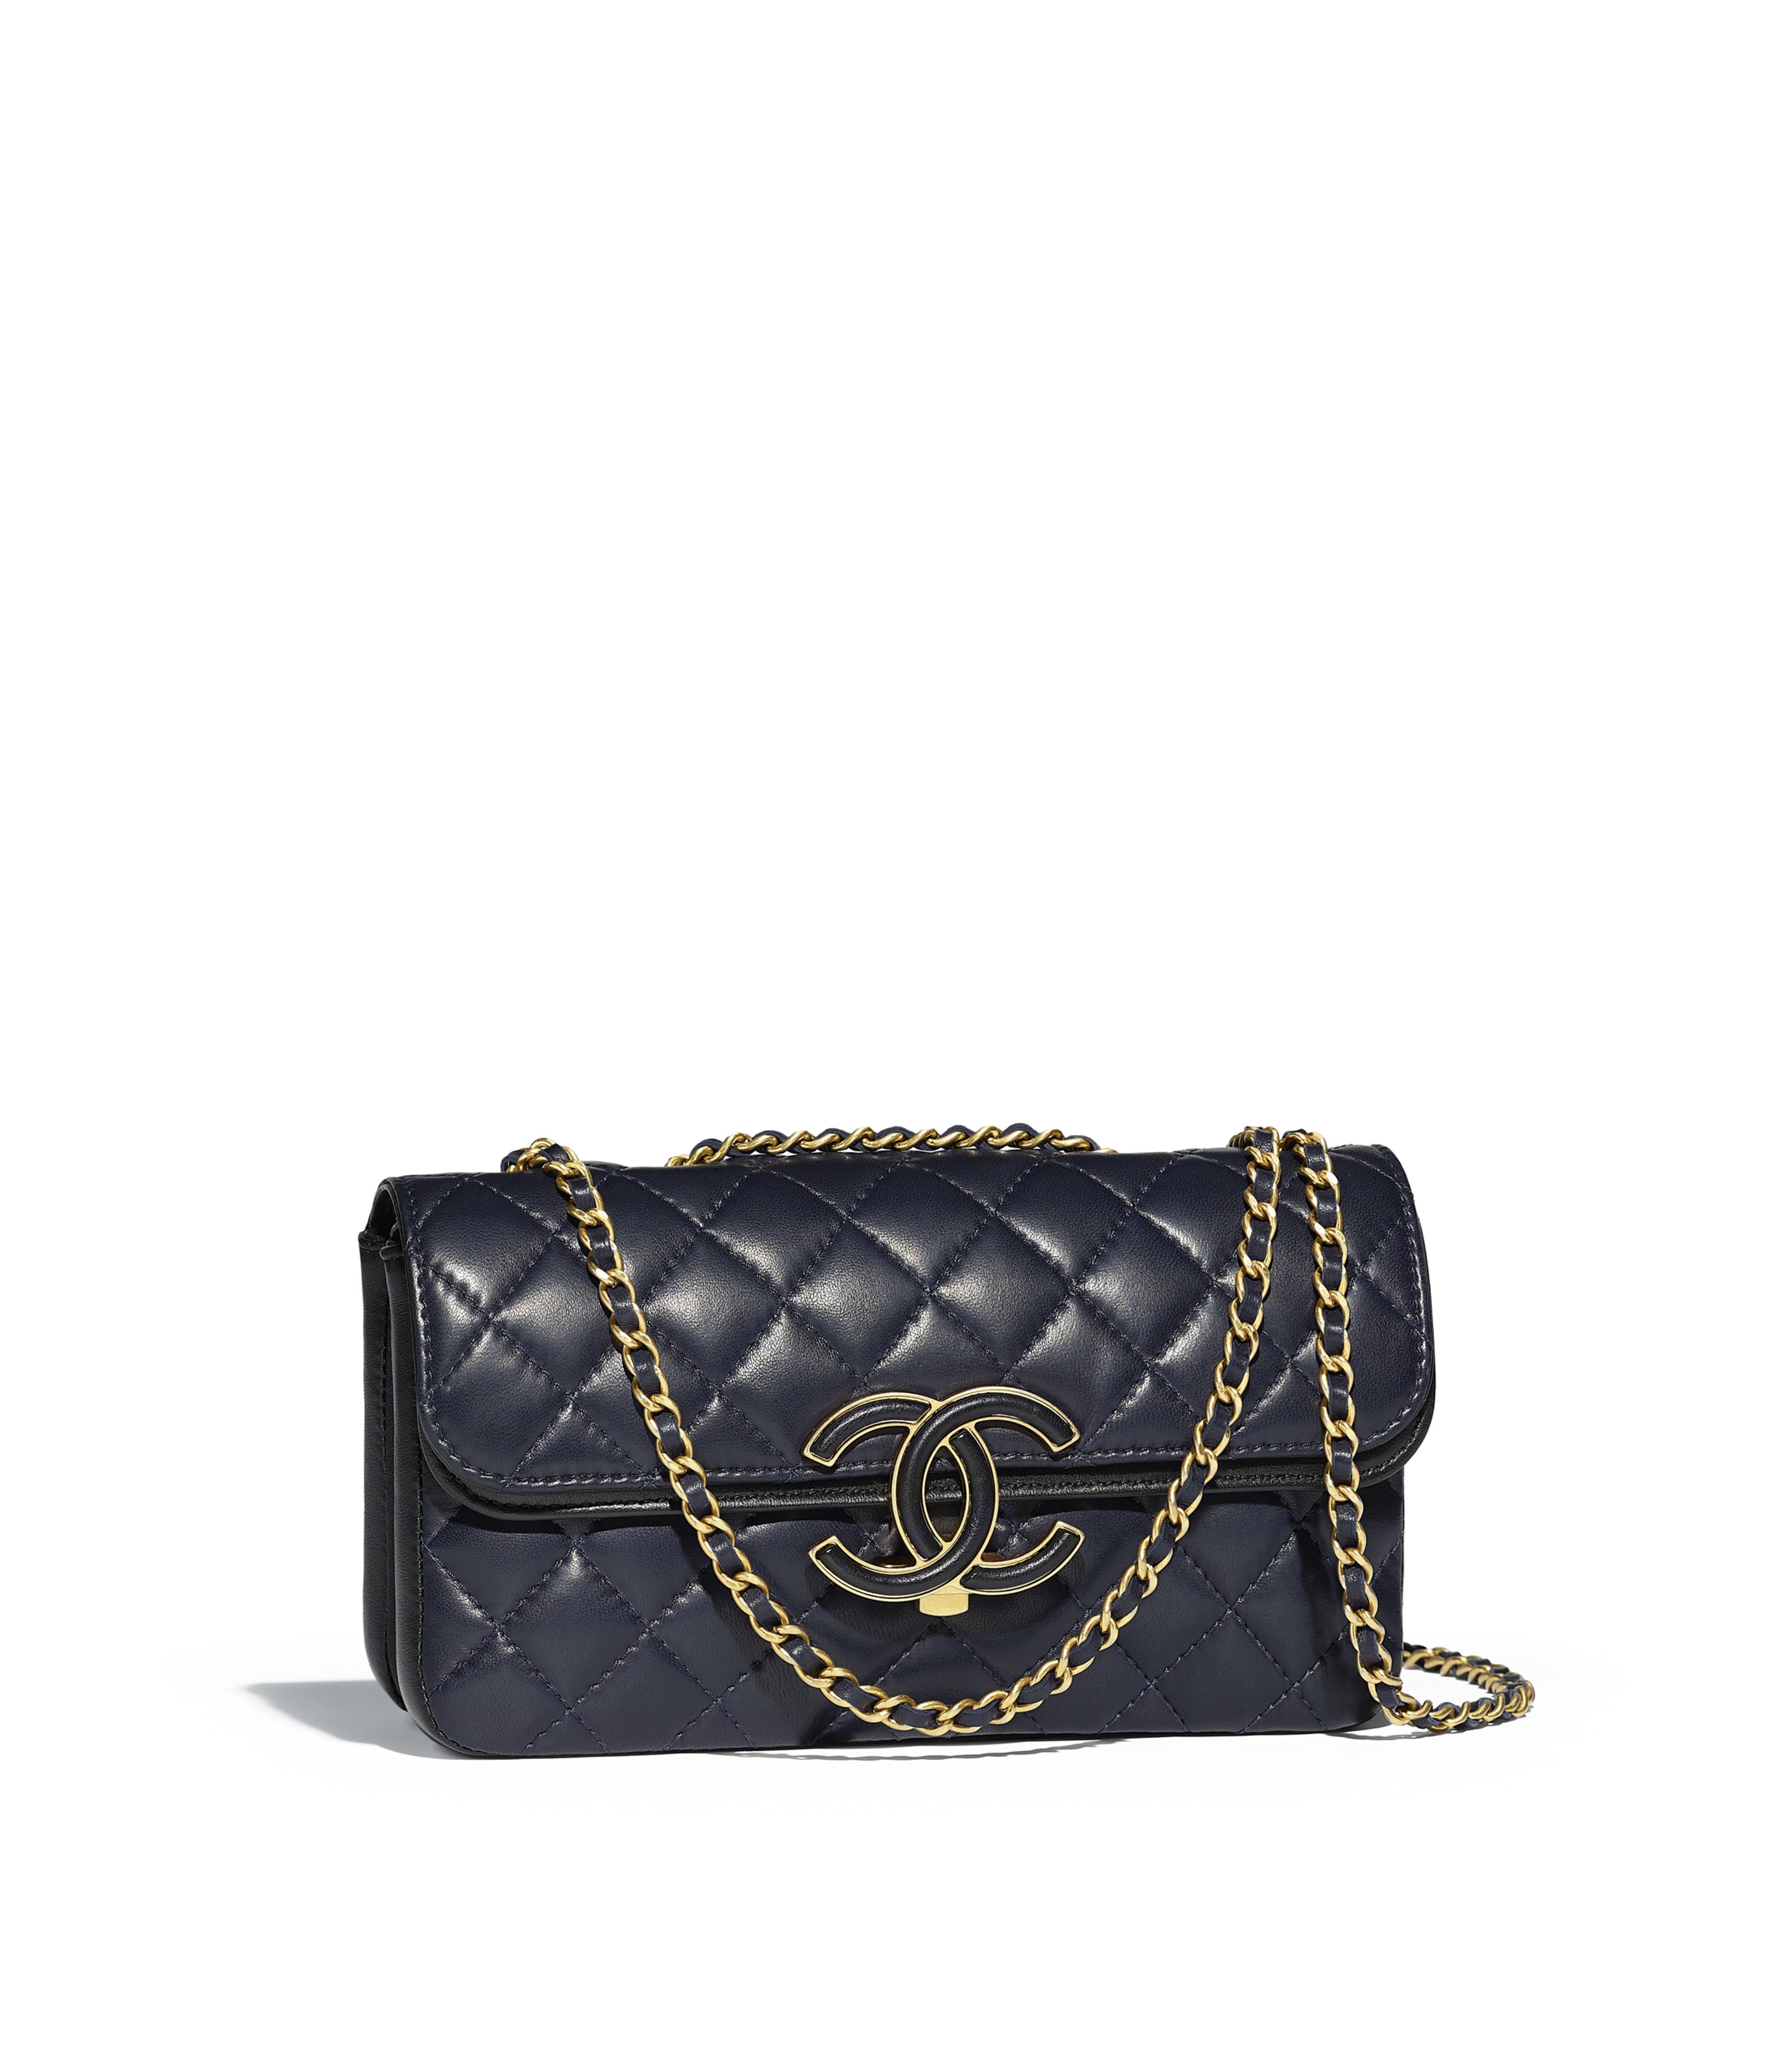 Flap Bag Lambskin Gold Tone Metal Navy Blue Black Ref A57275y83664c0215